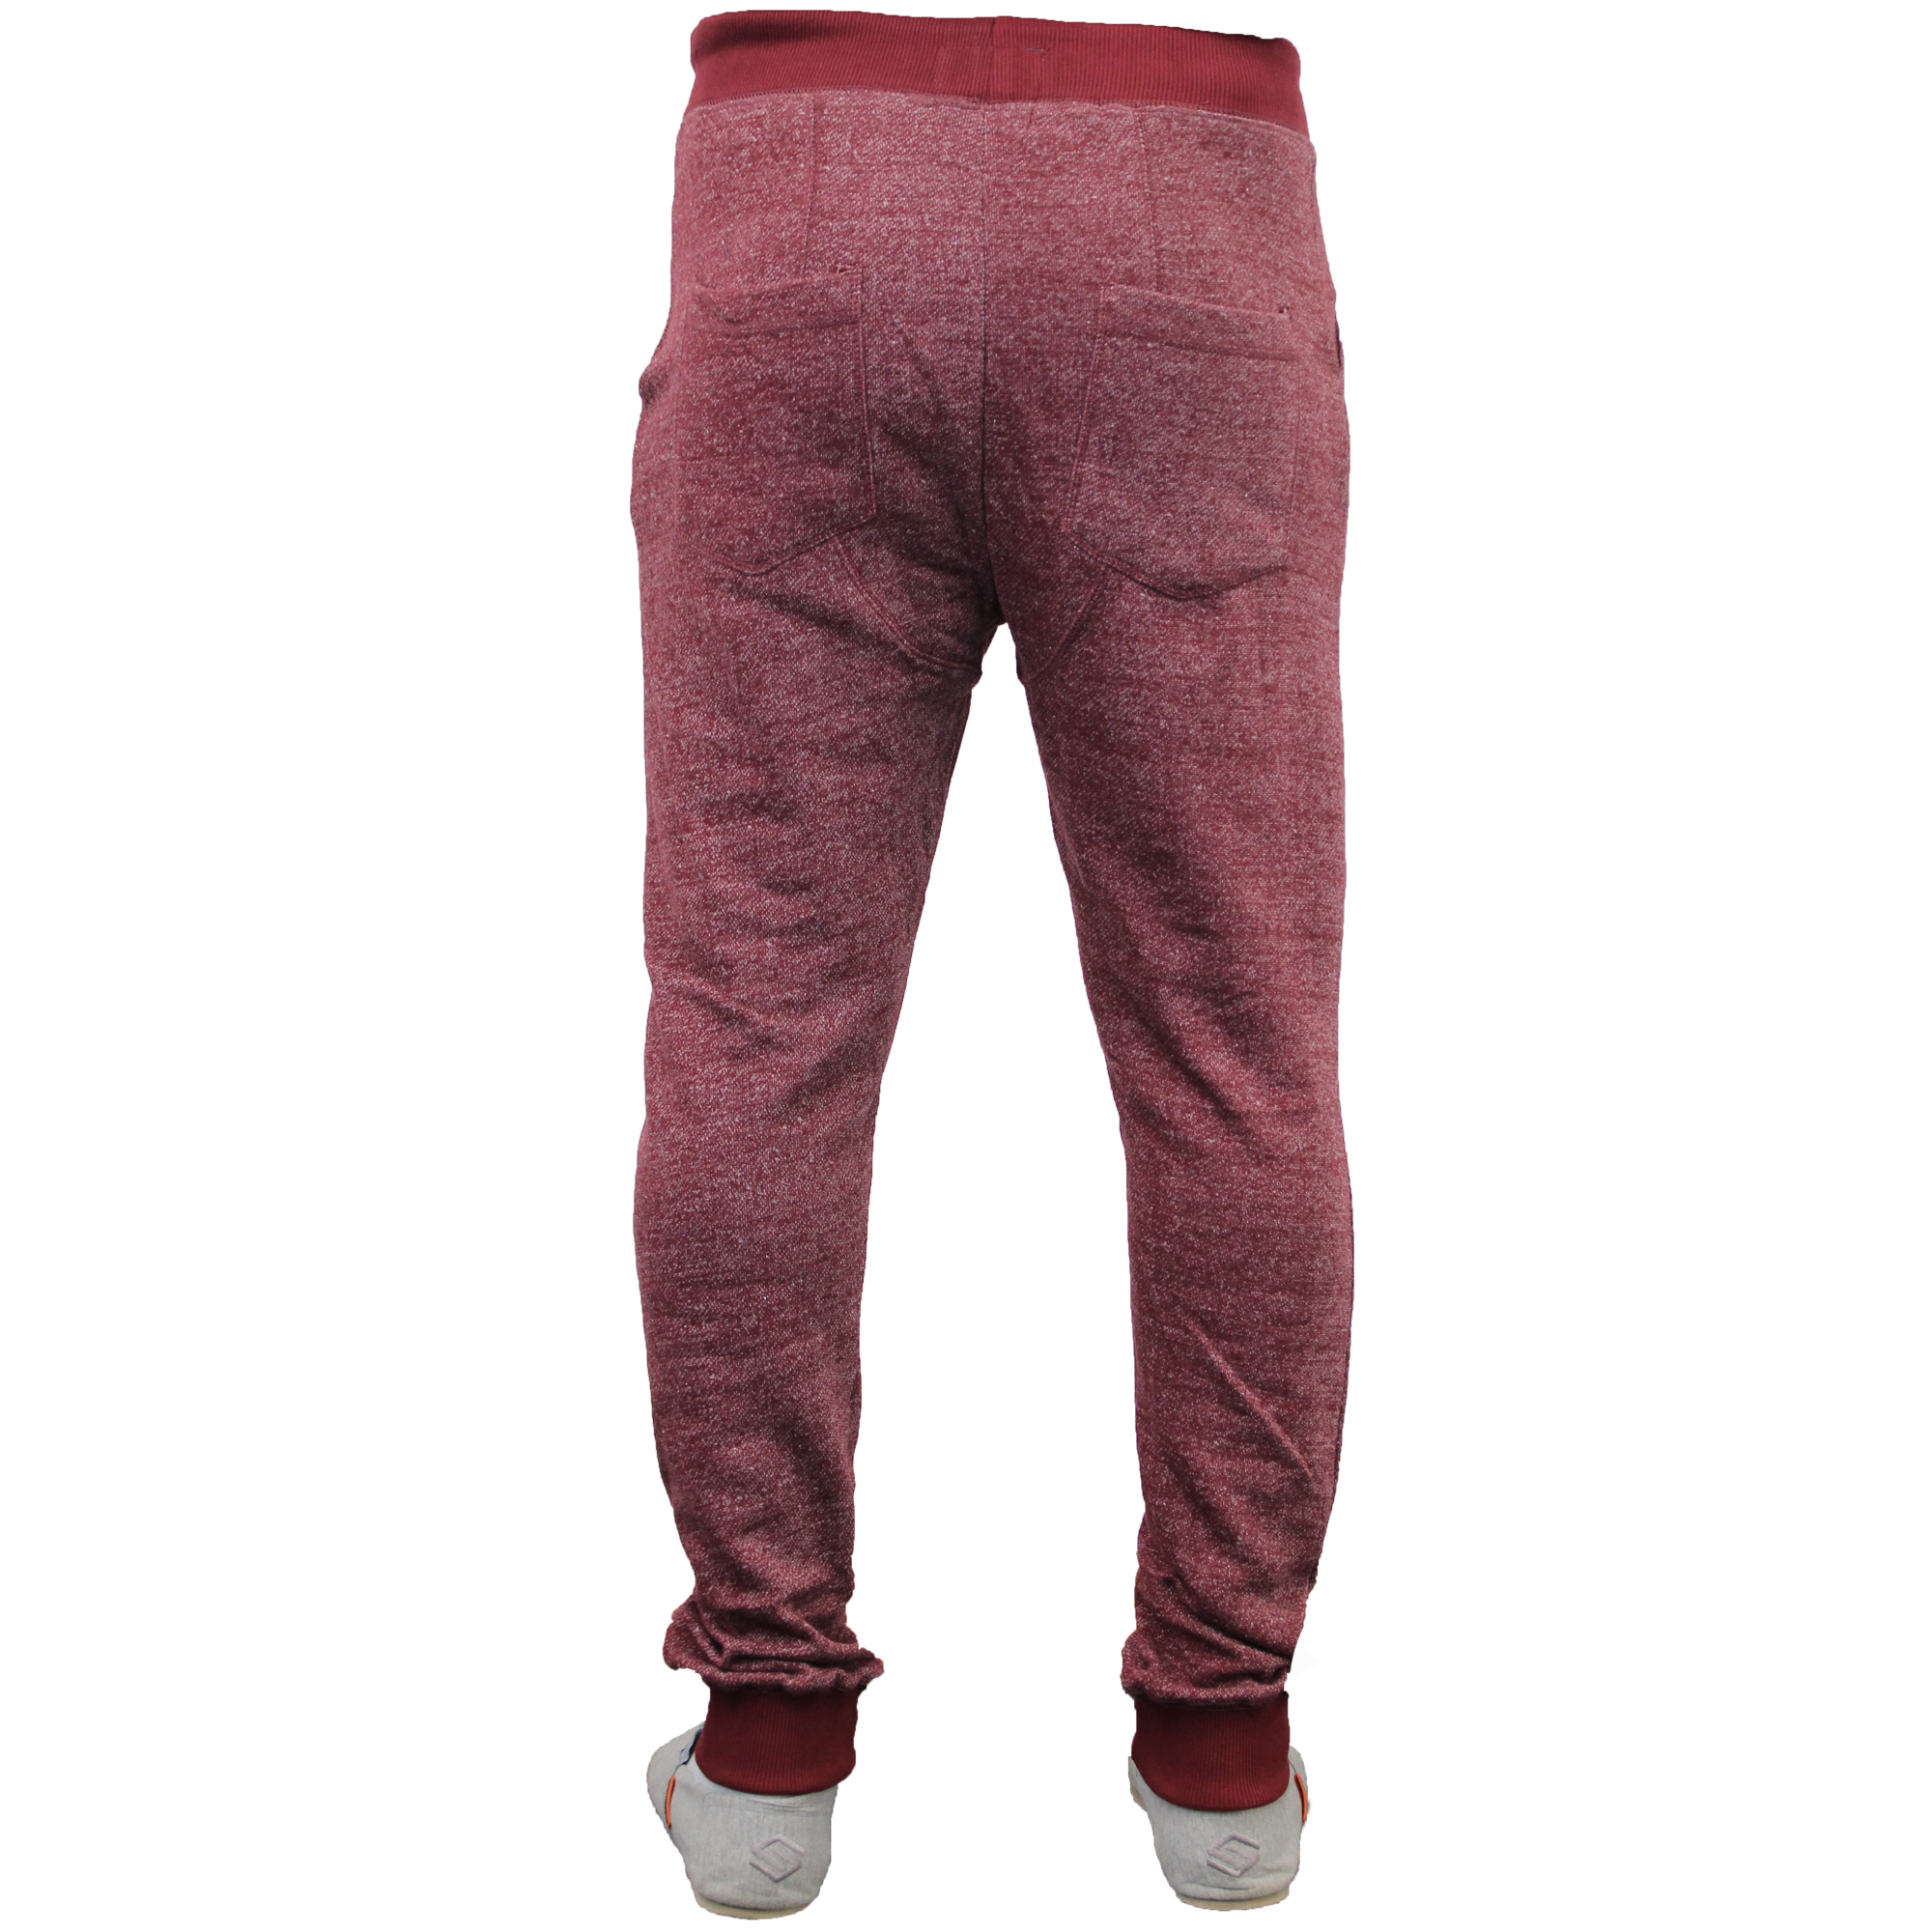 Mens Bottoms Soul Star Trousers Pants Jogging Drop Crotch Slim Fit Marl Running